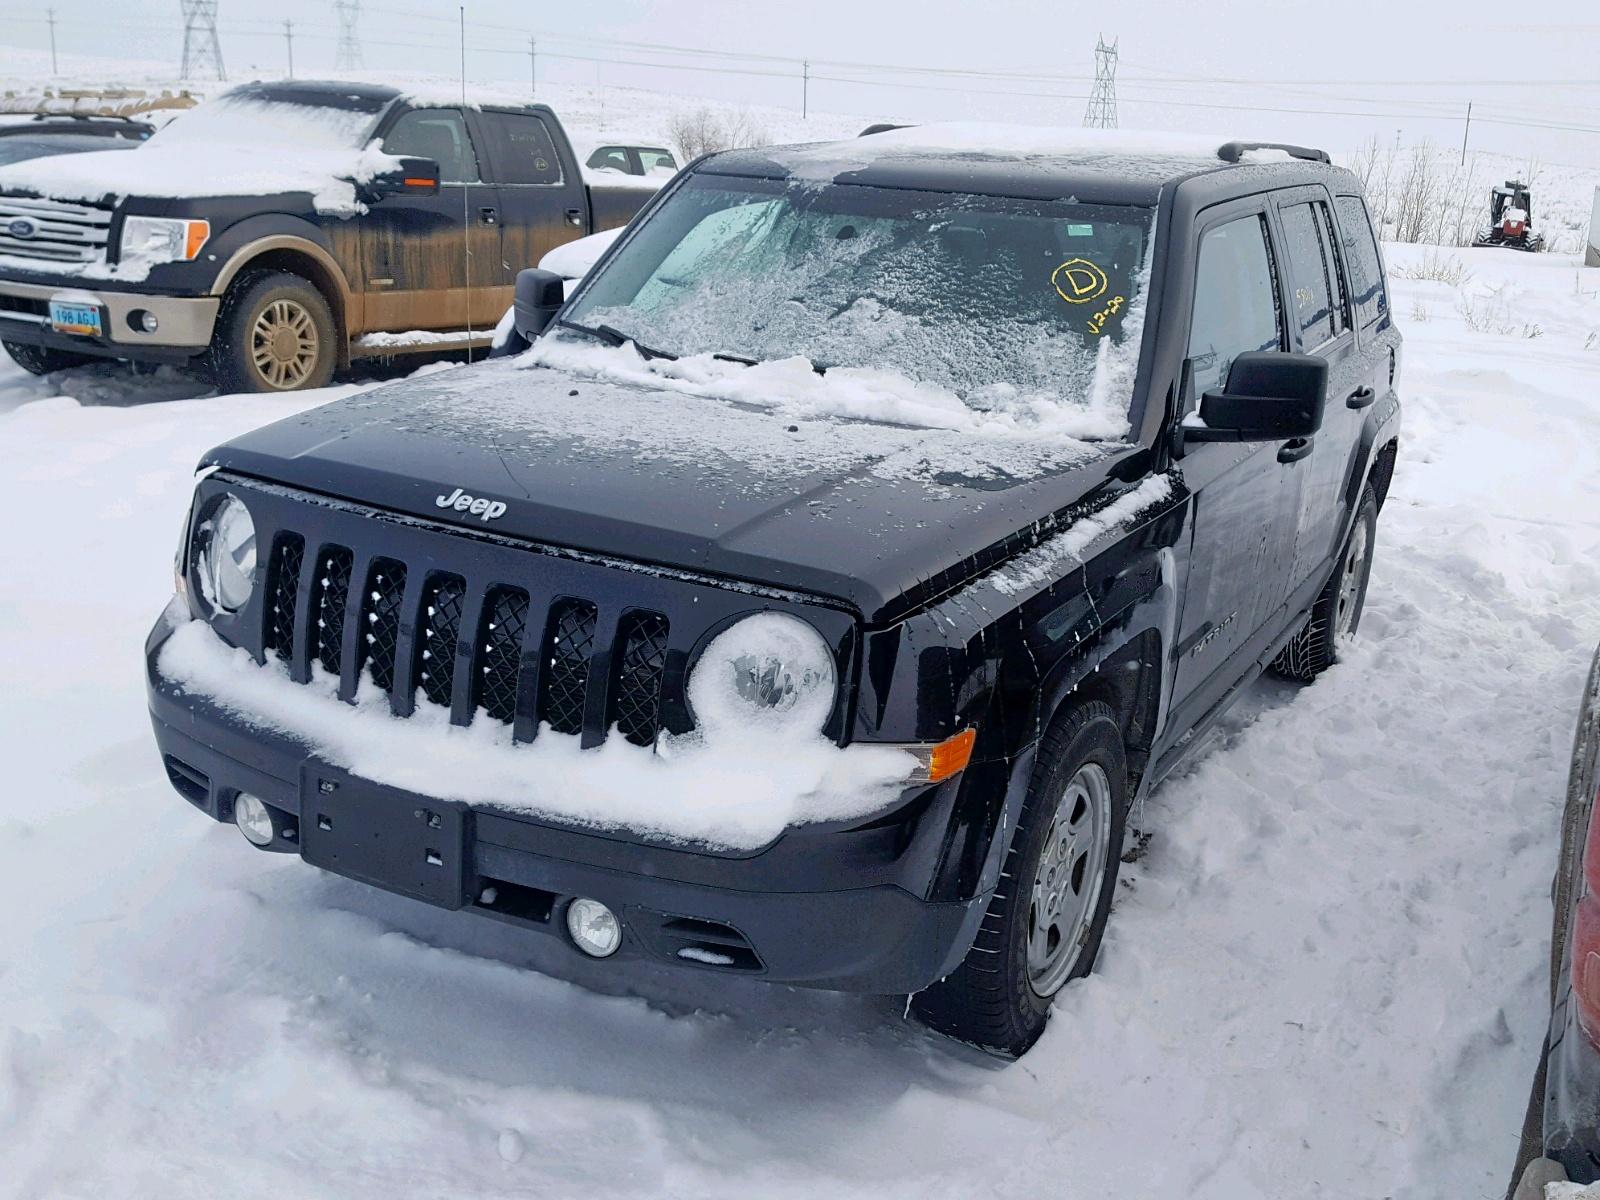 2014 Jeep Patriot Sp 2.0L Right View